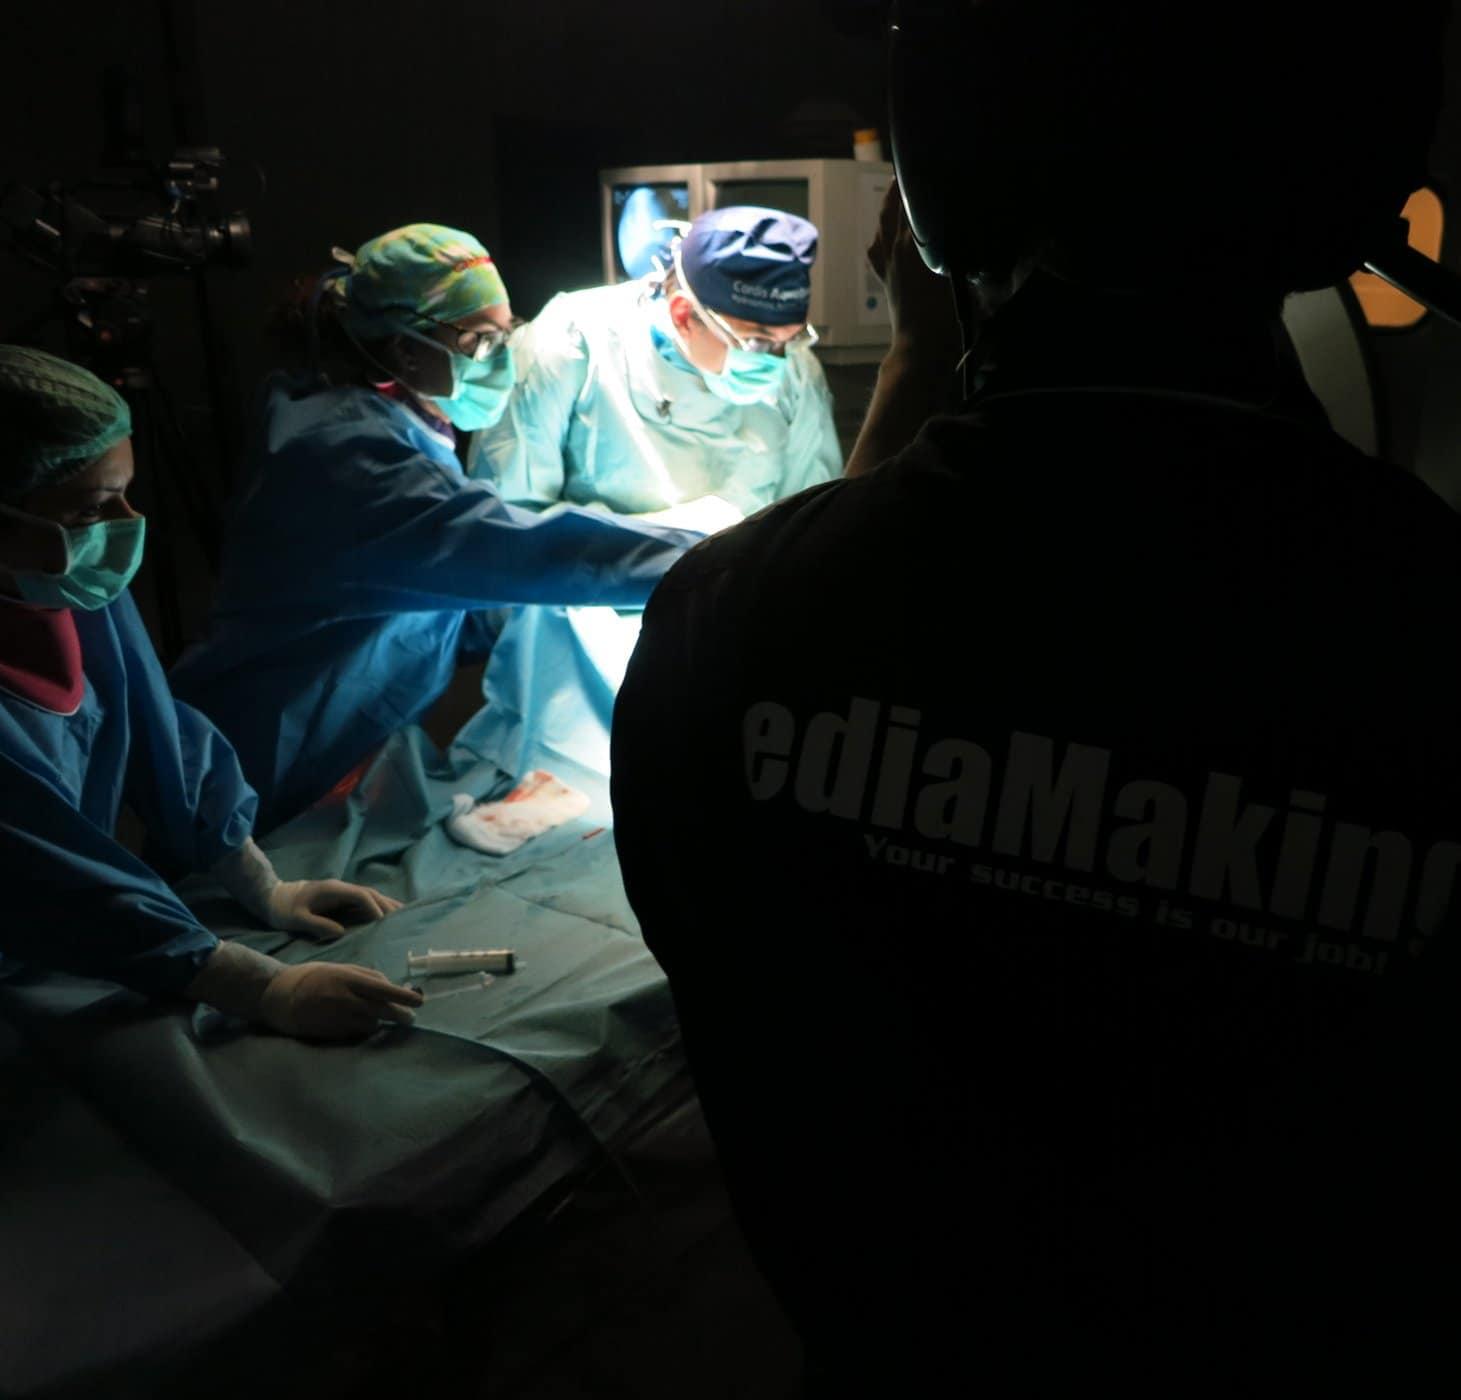 riprese-mediche-interventi-chirurgici-videoproduzione-postproduzione (7)